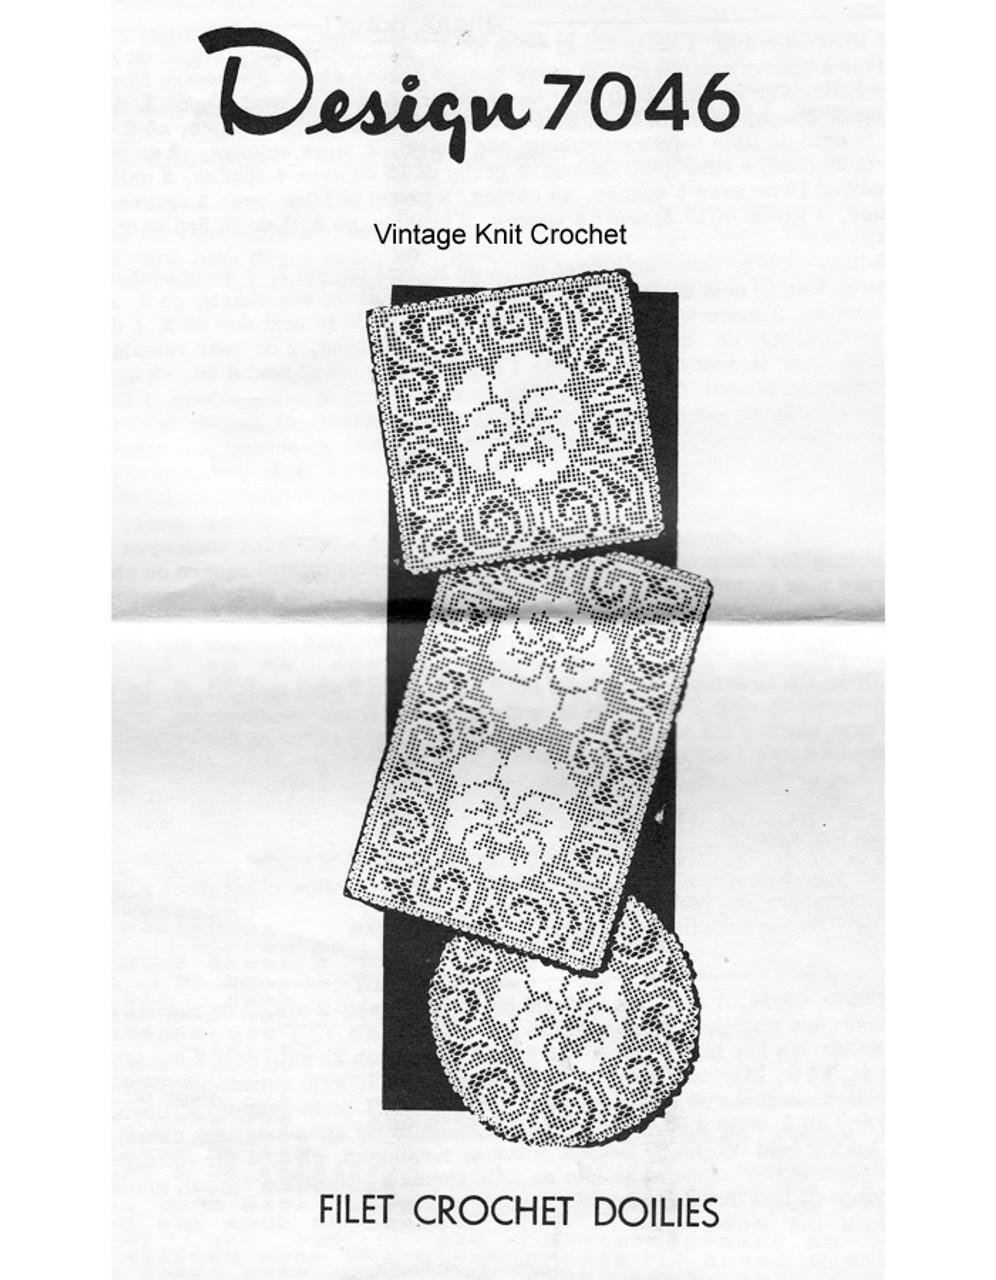 Square Filet Crochet Doily Pattern, Pansy, Mail Order 7046